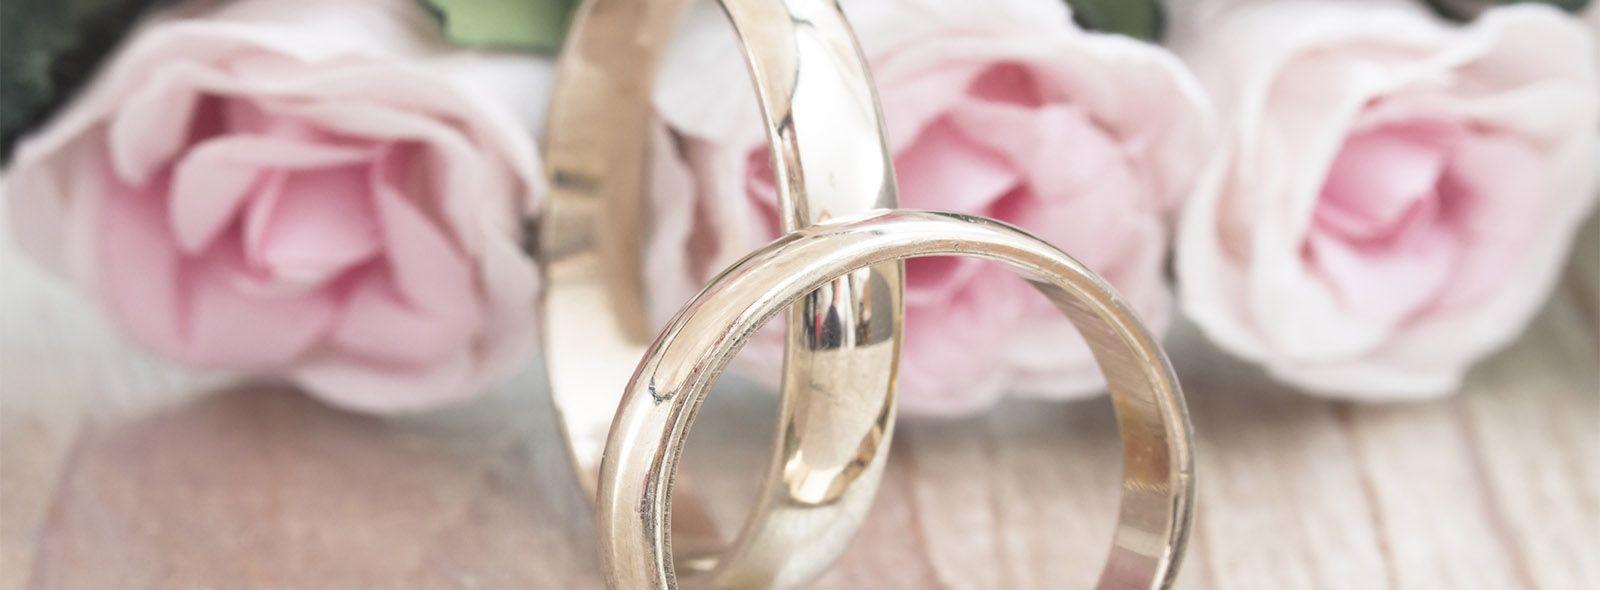 Anniversario Matrimonio Origini.Anniversari Di Matrimonio Colori Trovami